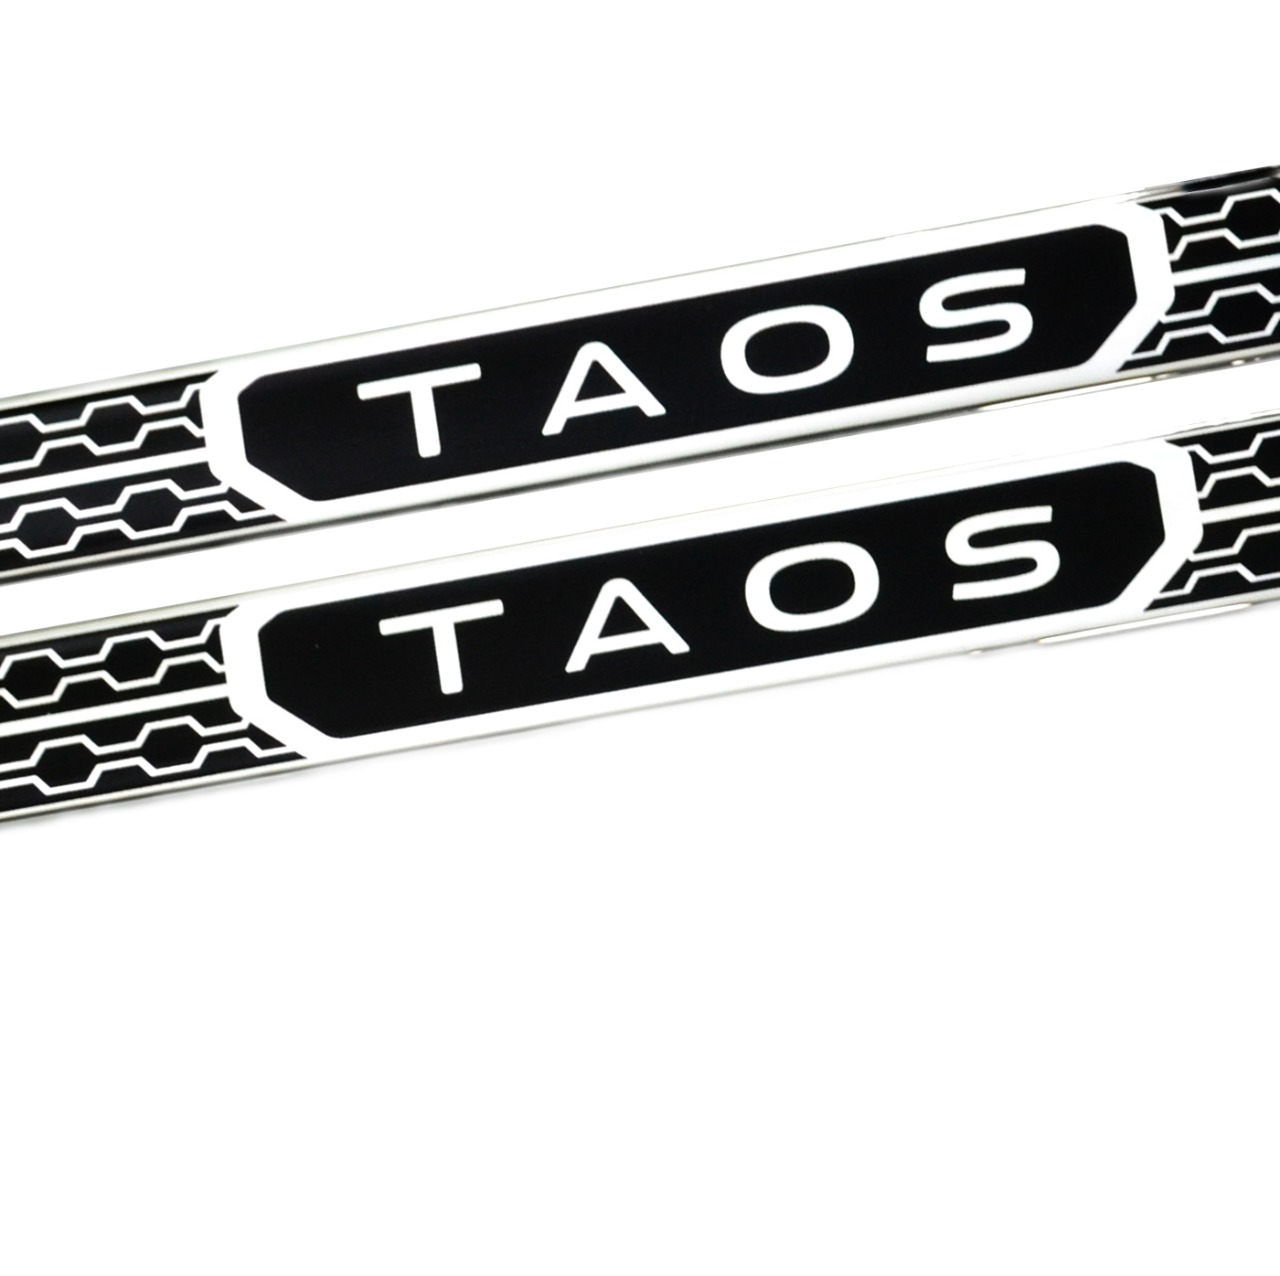 Soleira Porta Taos Resinada Premium Elegance